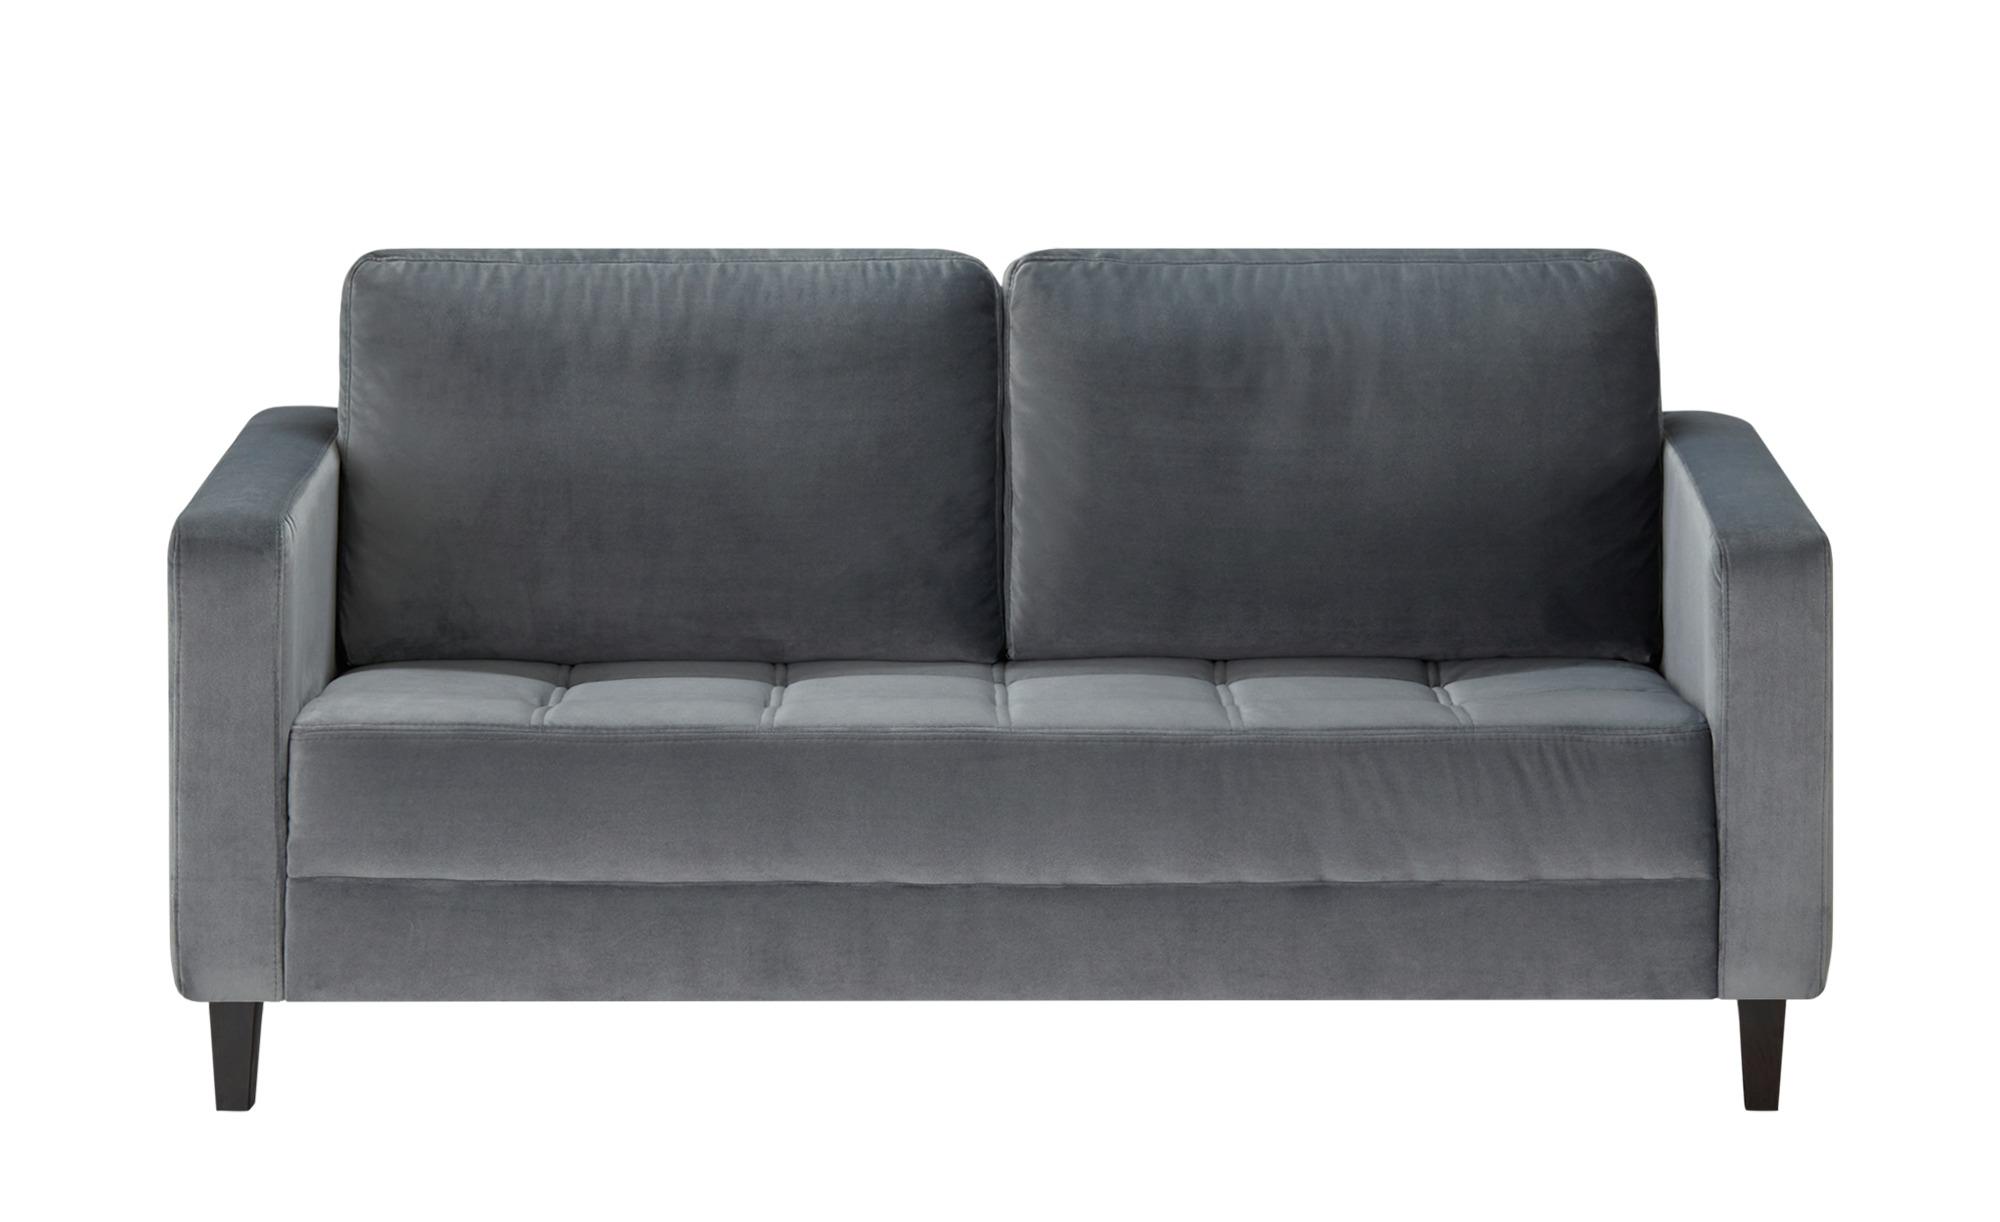 smart Sofa grau - Mikrofaser Geradine ¦ grau ¦ Maße (cm): B: 177 H: 93 T: 92 Polstermöbel > Sofas > 2-Sitzer - Höffner